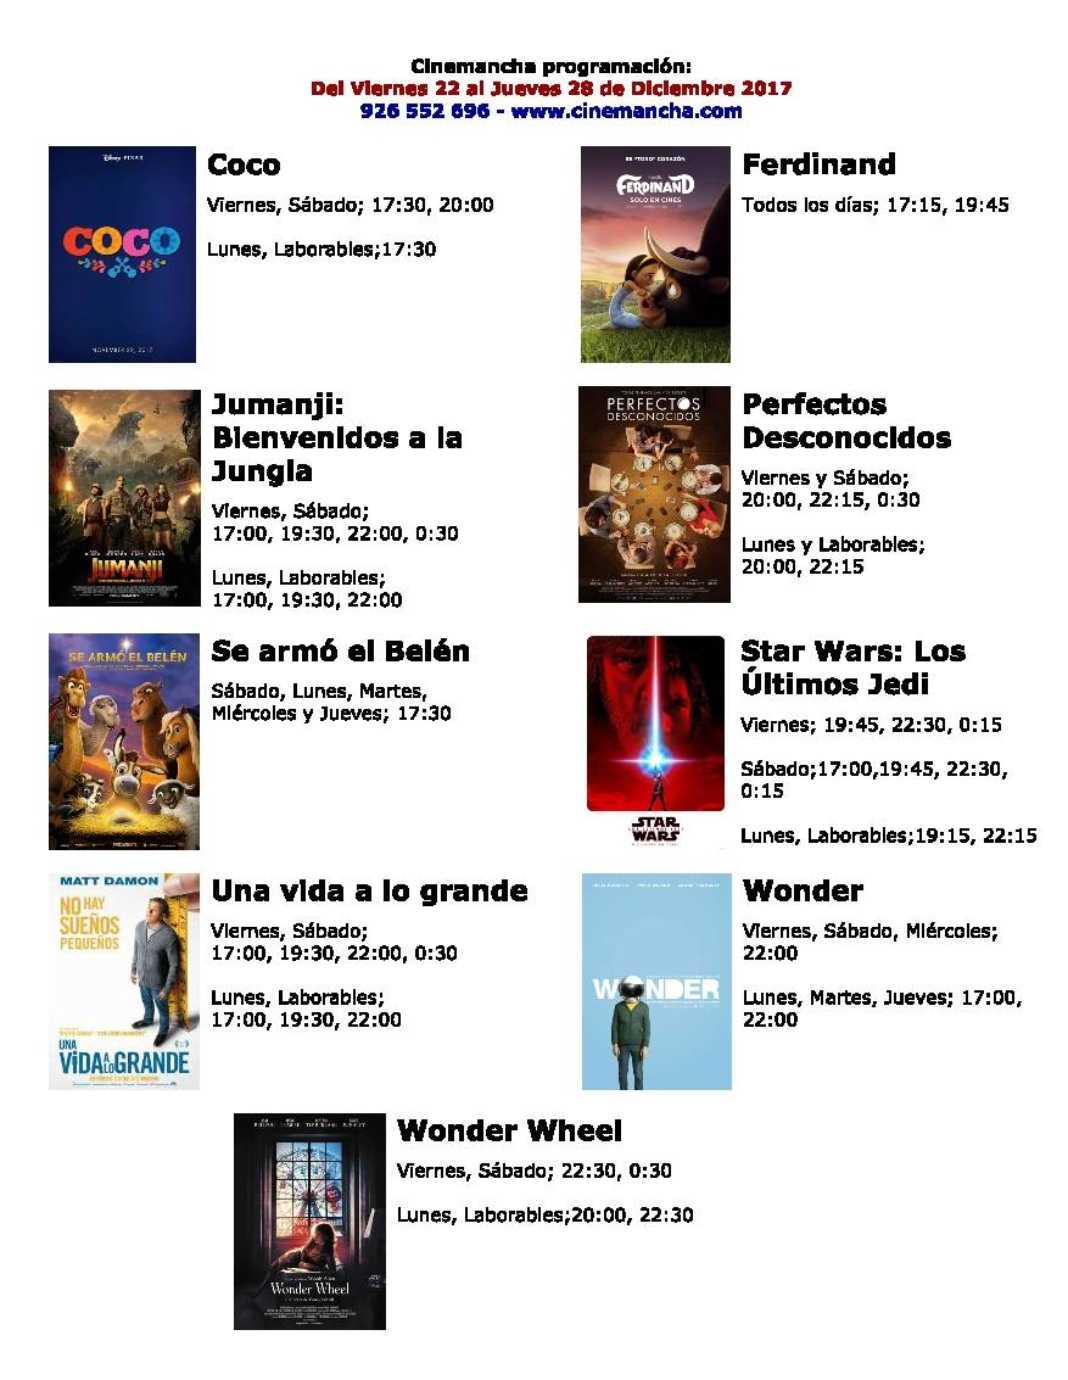 cartelera de cinemancha para la semana del 22 al 28 de diciembre 1068x1380 - Cartelera Cinemancha del 22 al 28 de diciembre